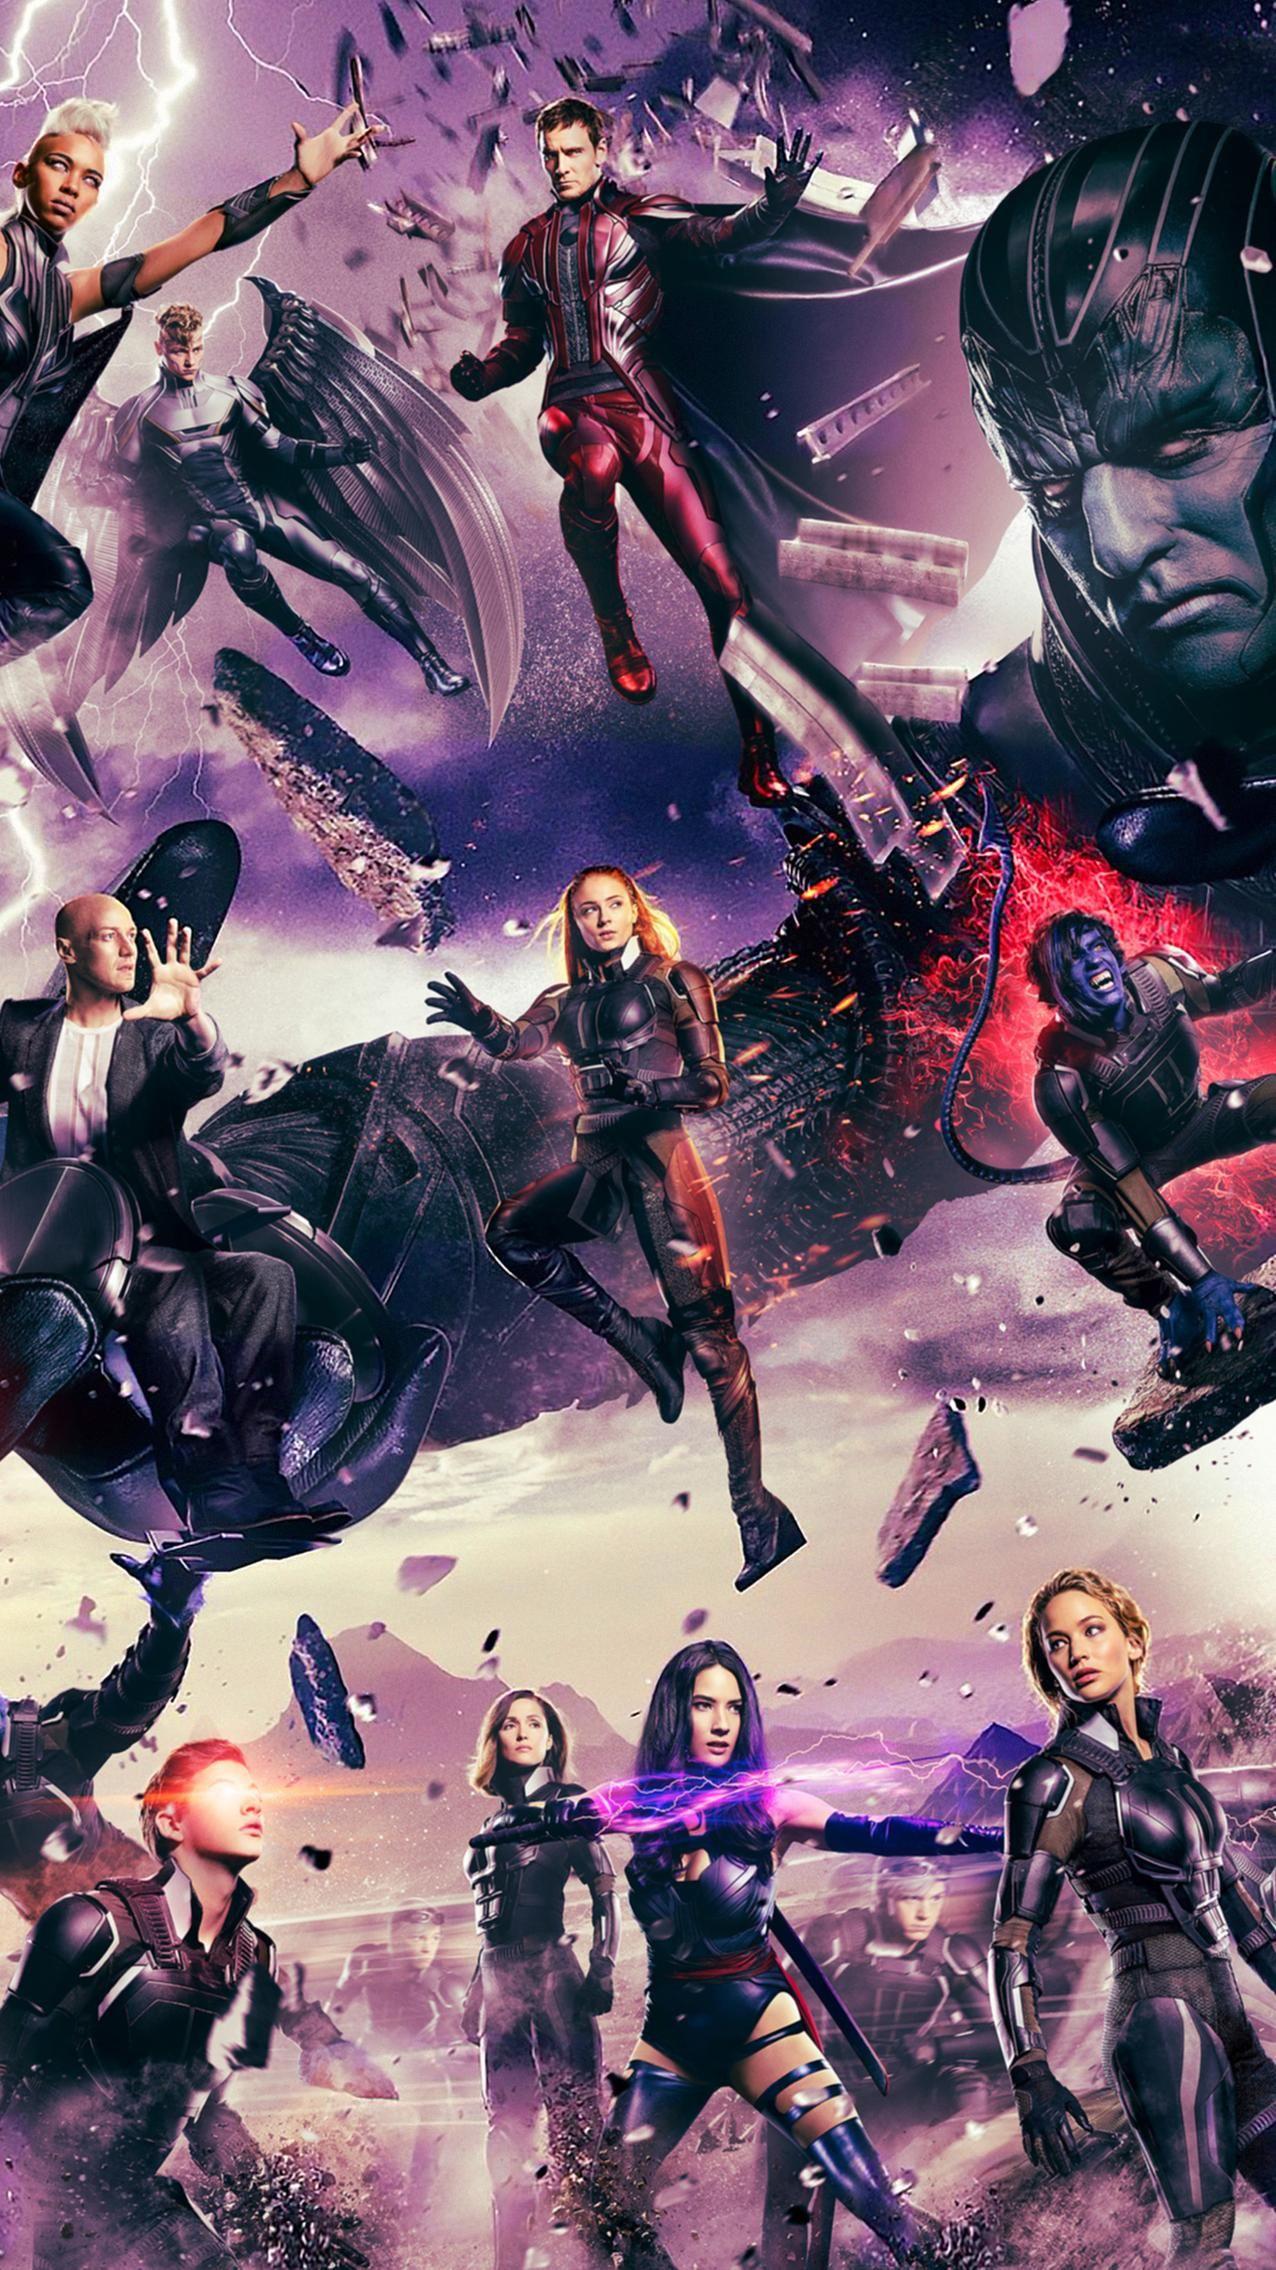 The Strain Phone Wallpaper X men, Xmen apocalypse, Psylocke